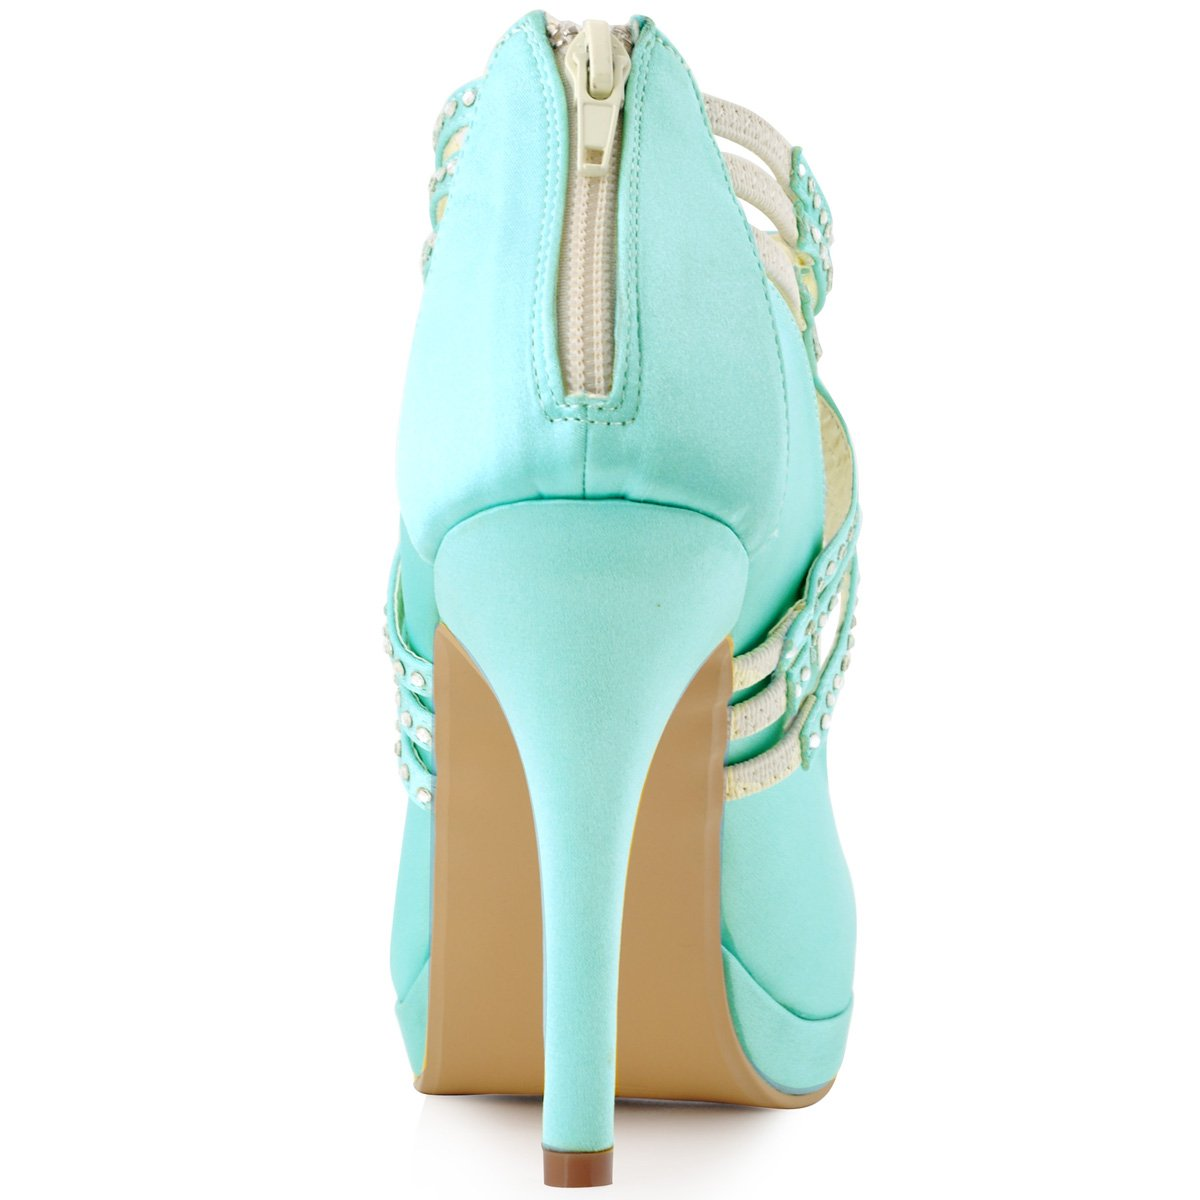 ElegantPark Women High Heel Pumps Closed Toe Platform Strappy Satin Evening Prom Dress Wedding Shoes B011B2ASTS 5 B(M) US Mint